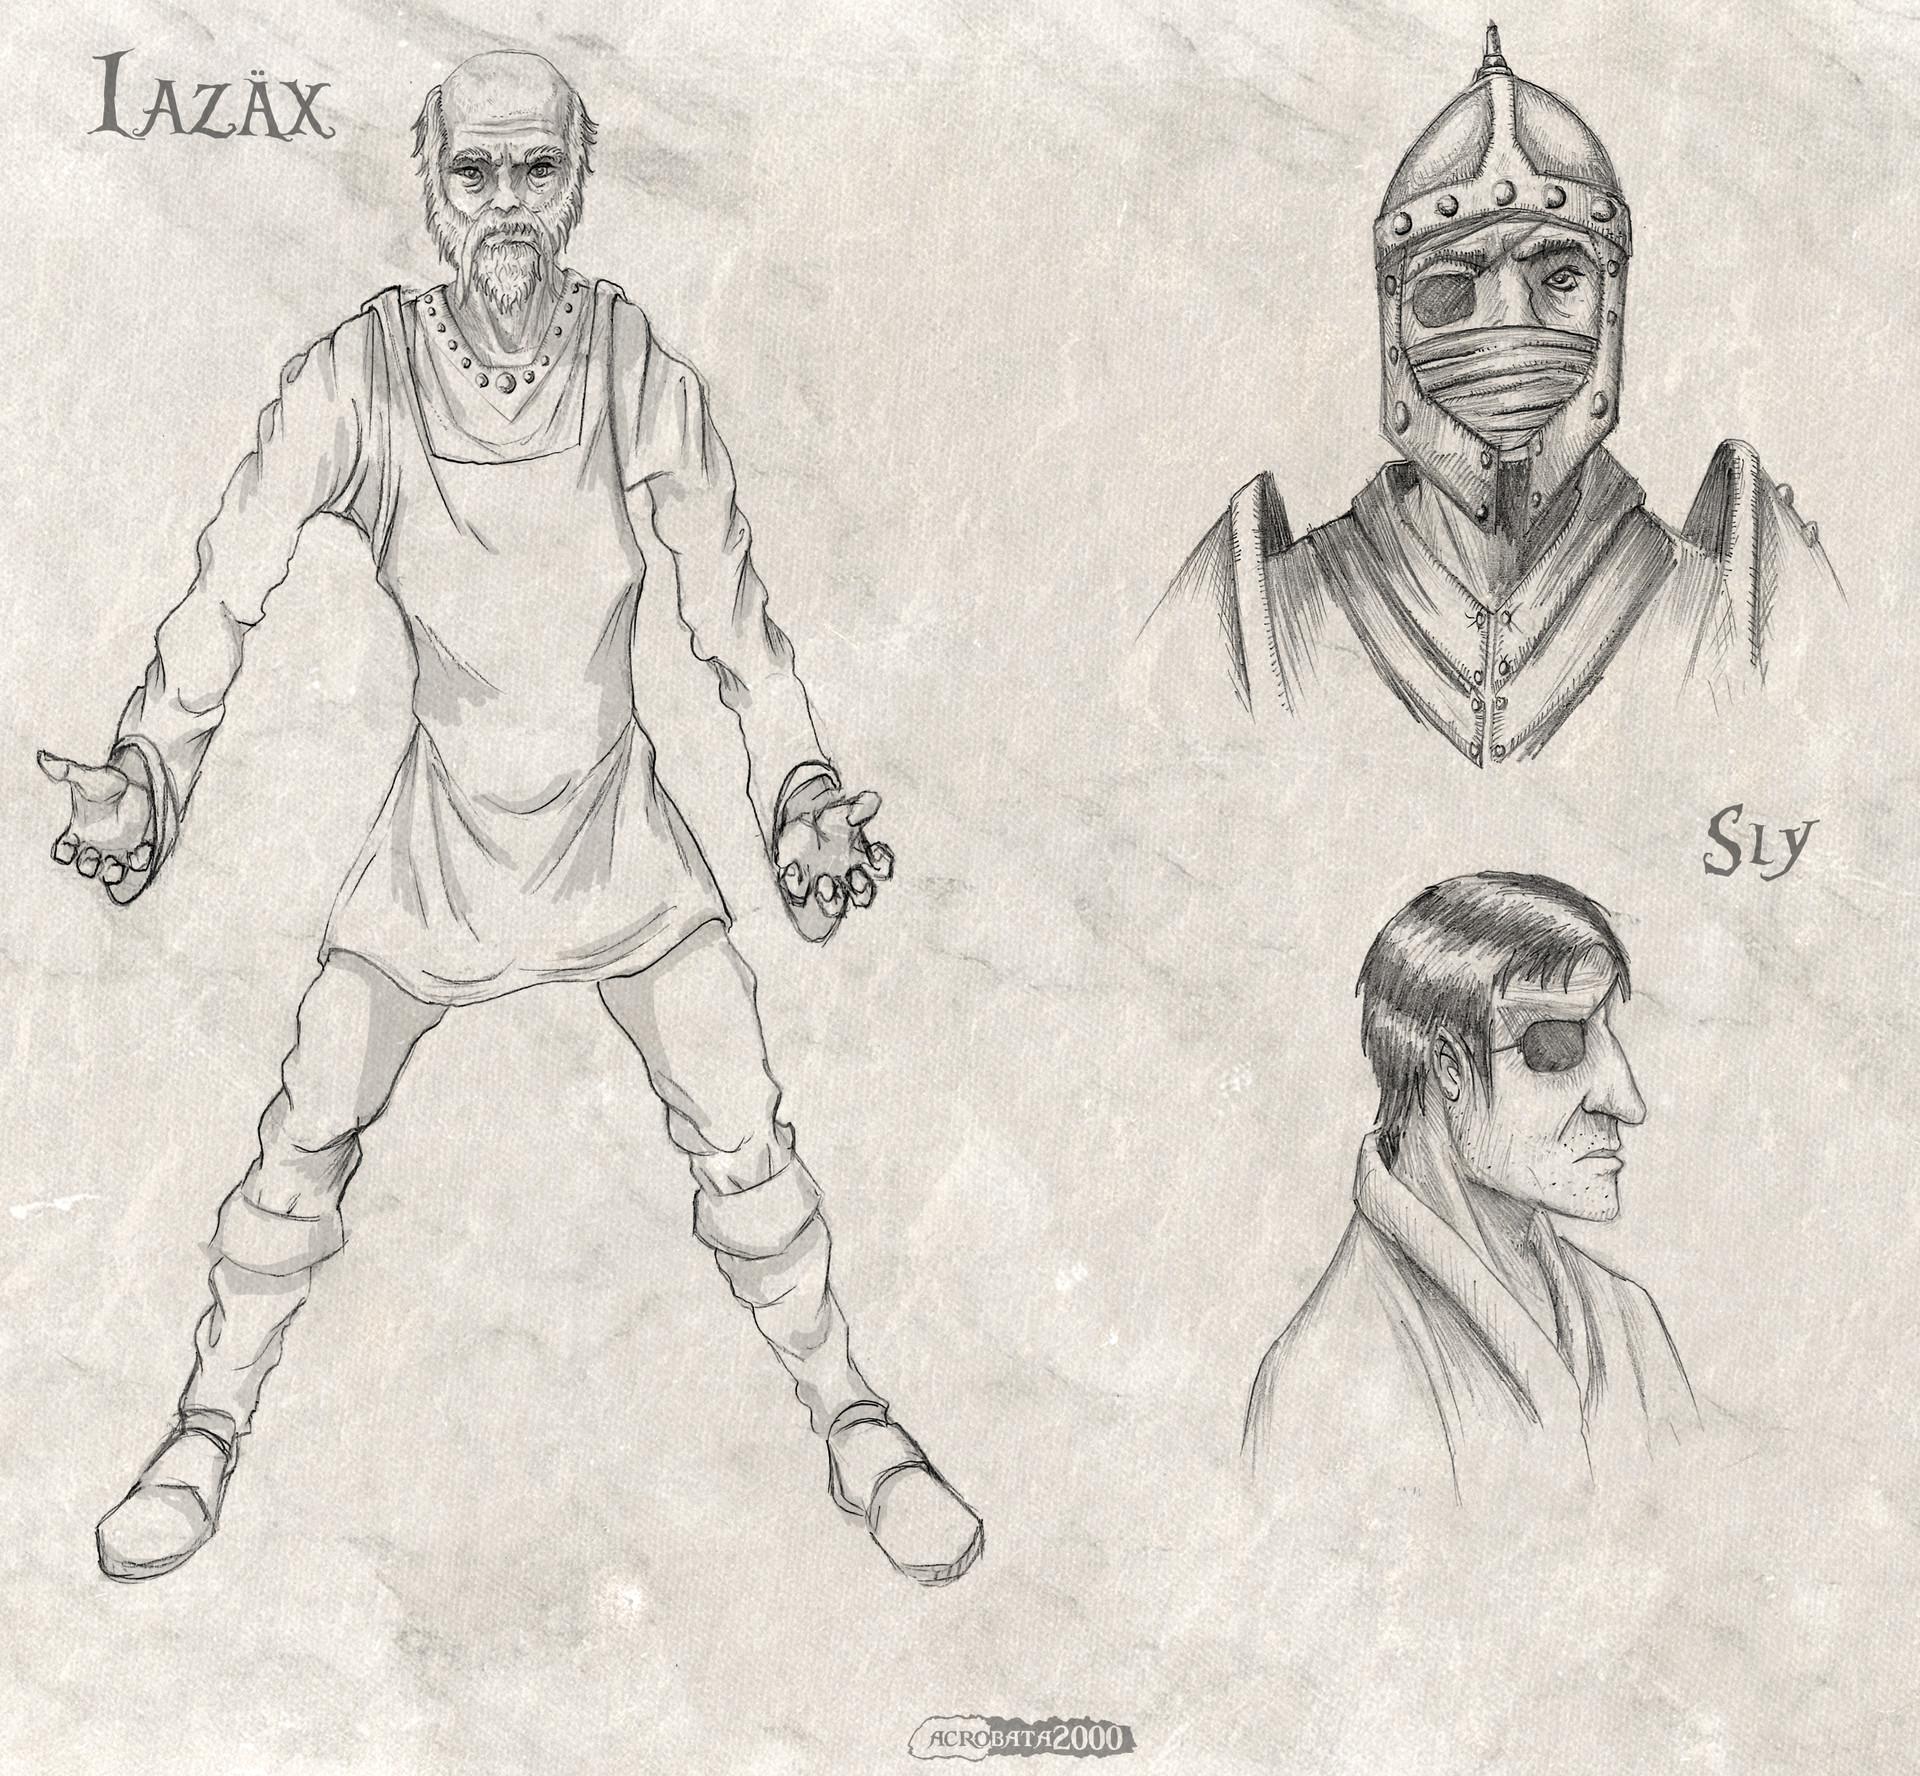 Acrobata2000 dosmil characters